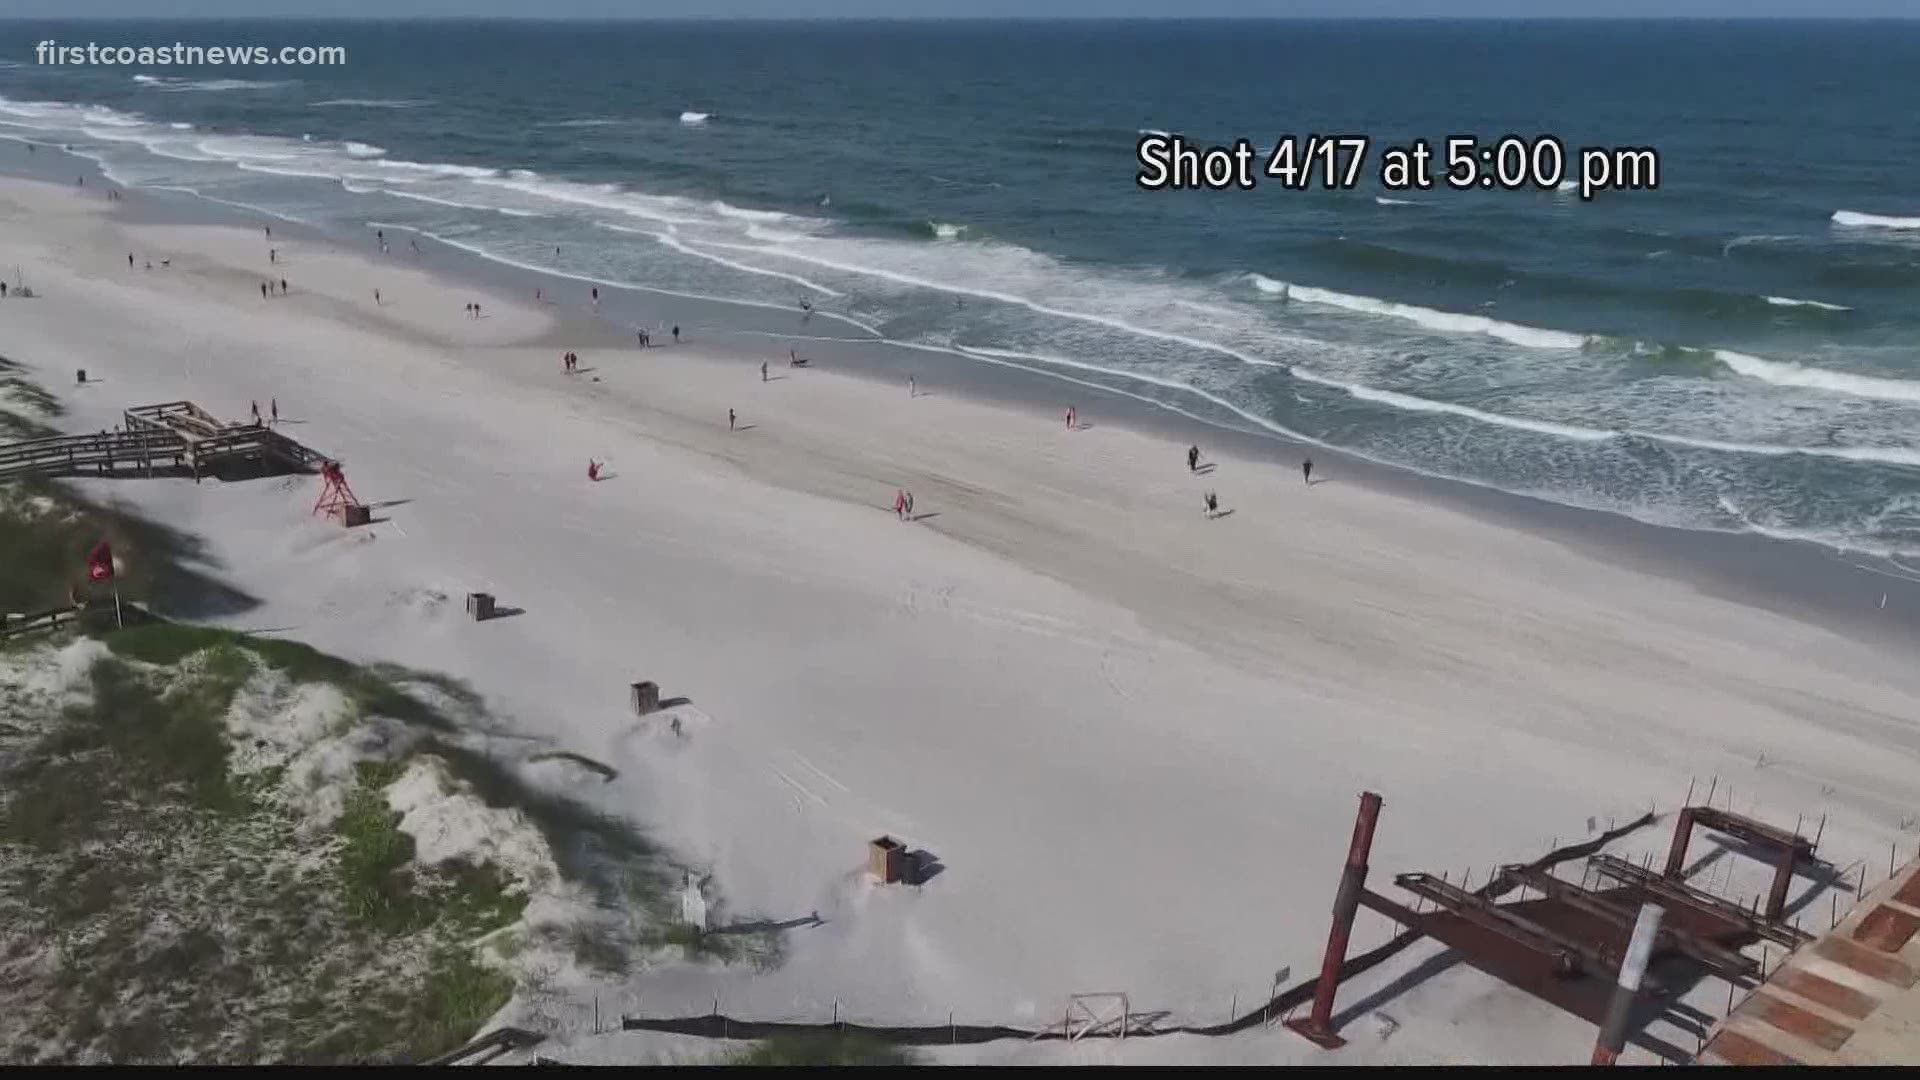 Are The Photos Of Jacksonville Beach